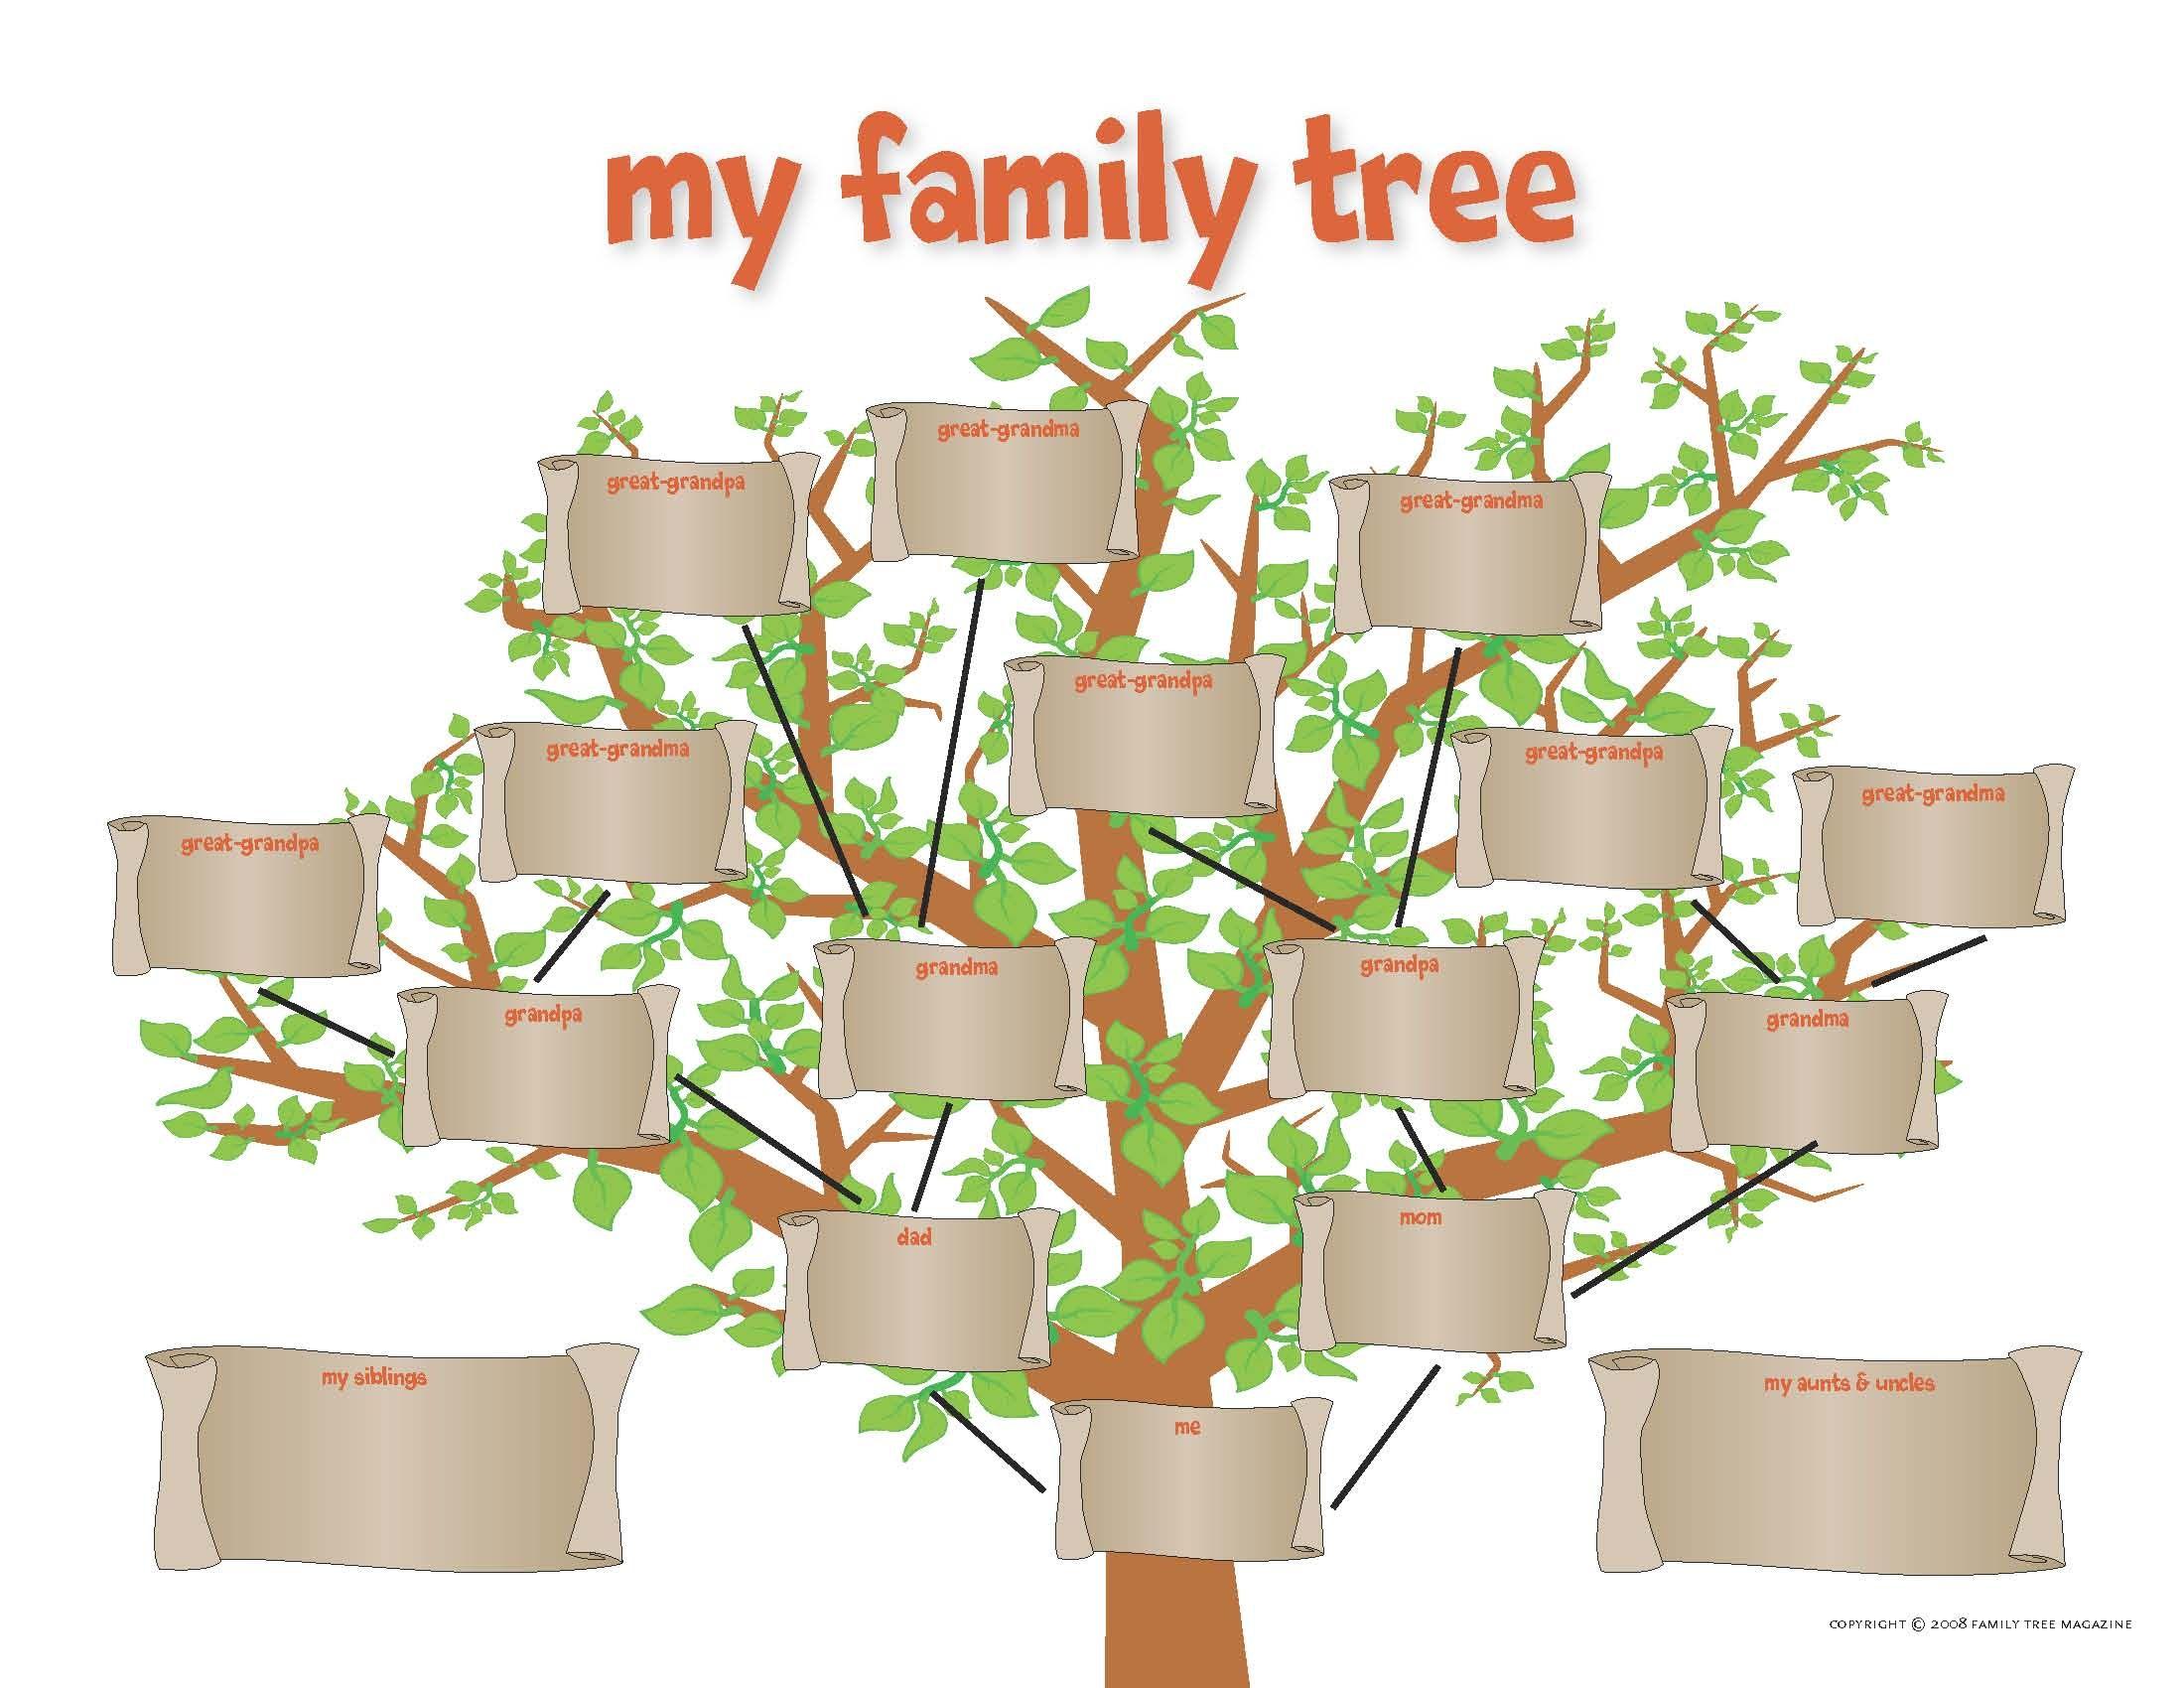 Uploadable And Fillable Family Tree Http Kids Familytreemagazine